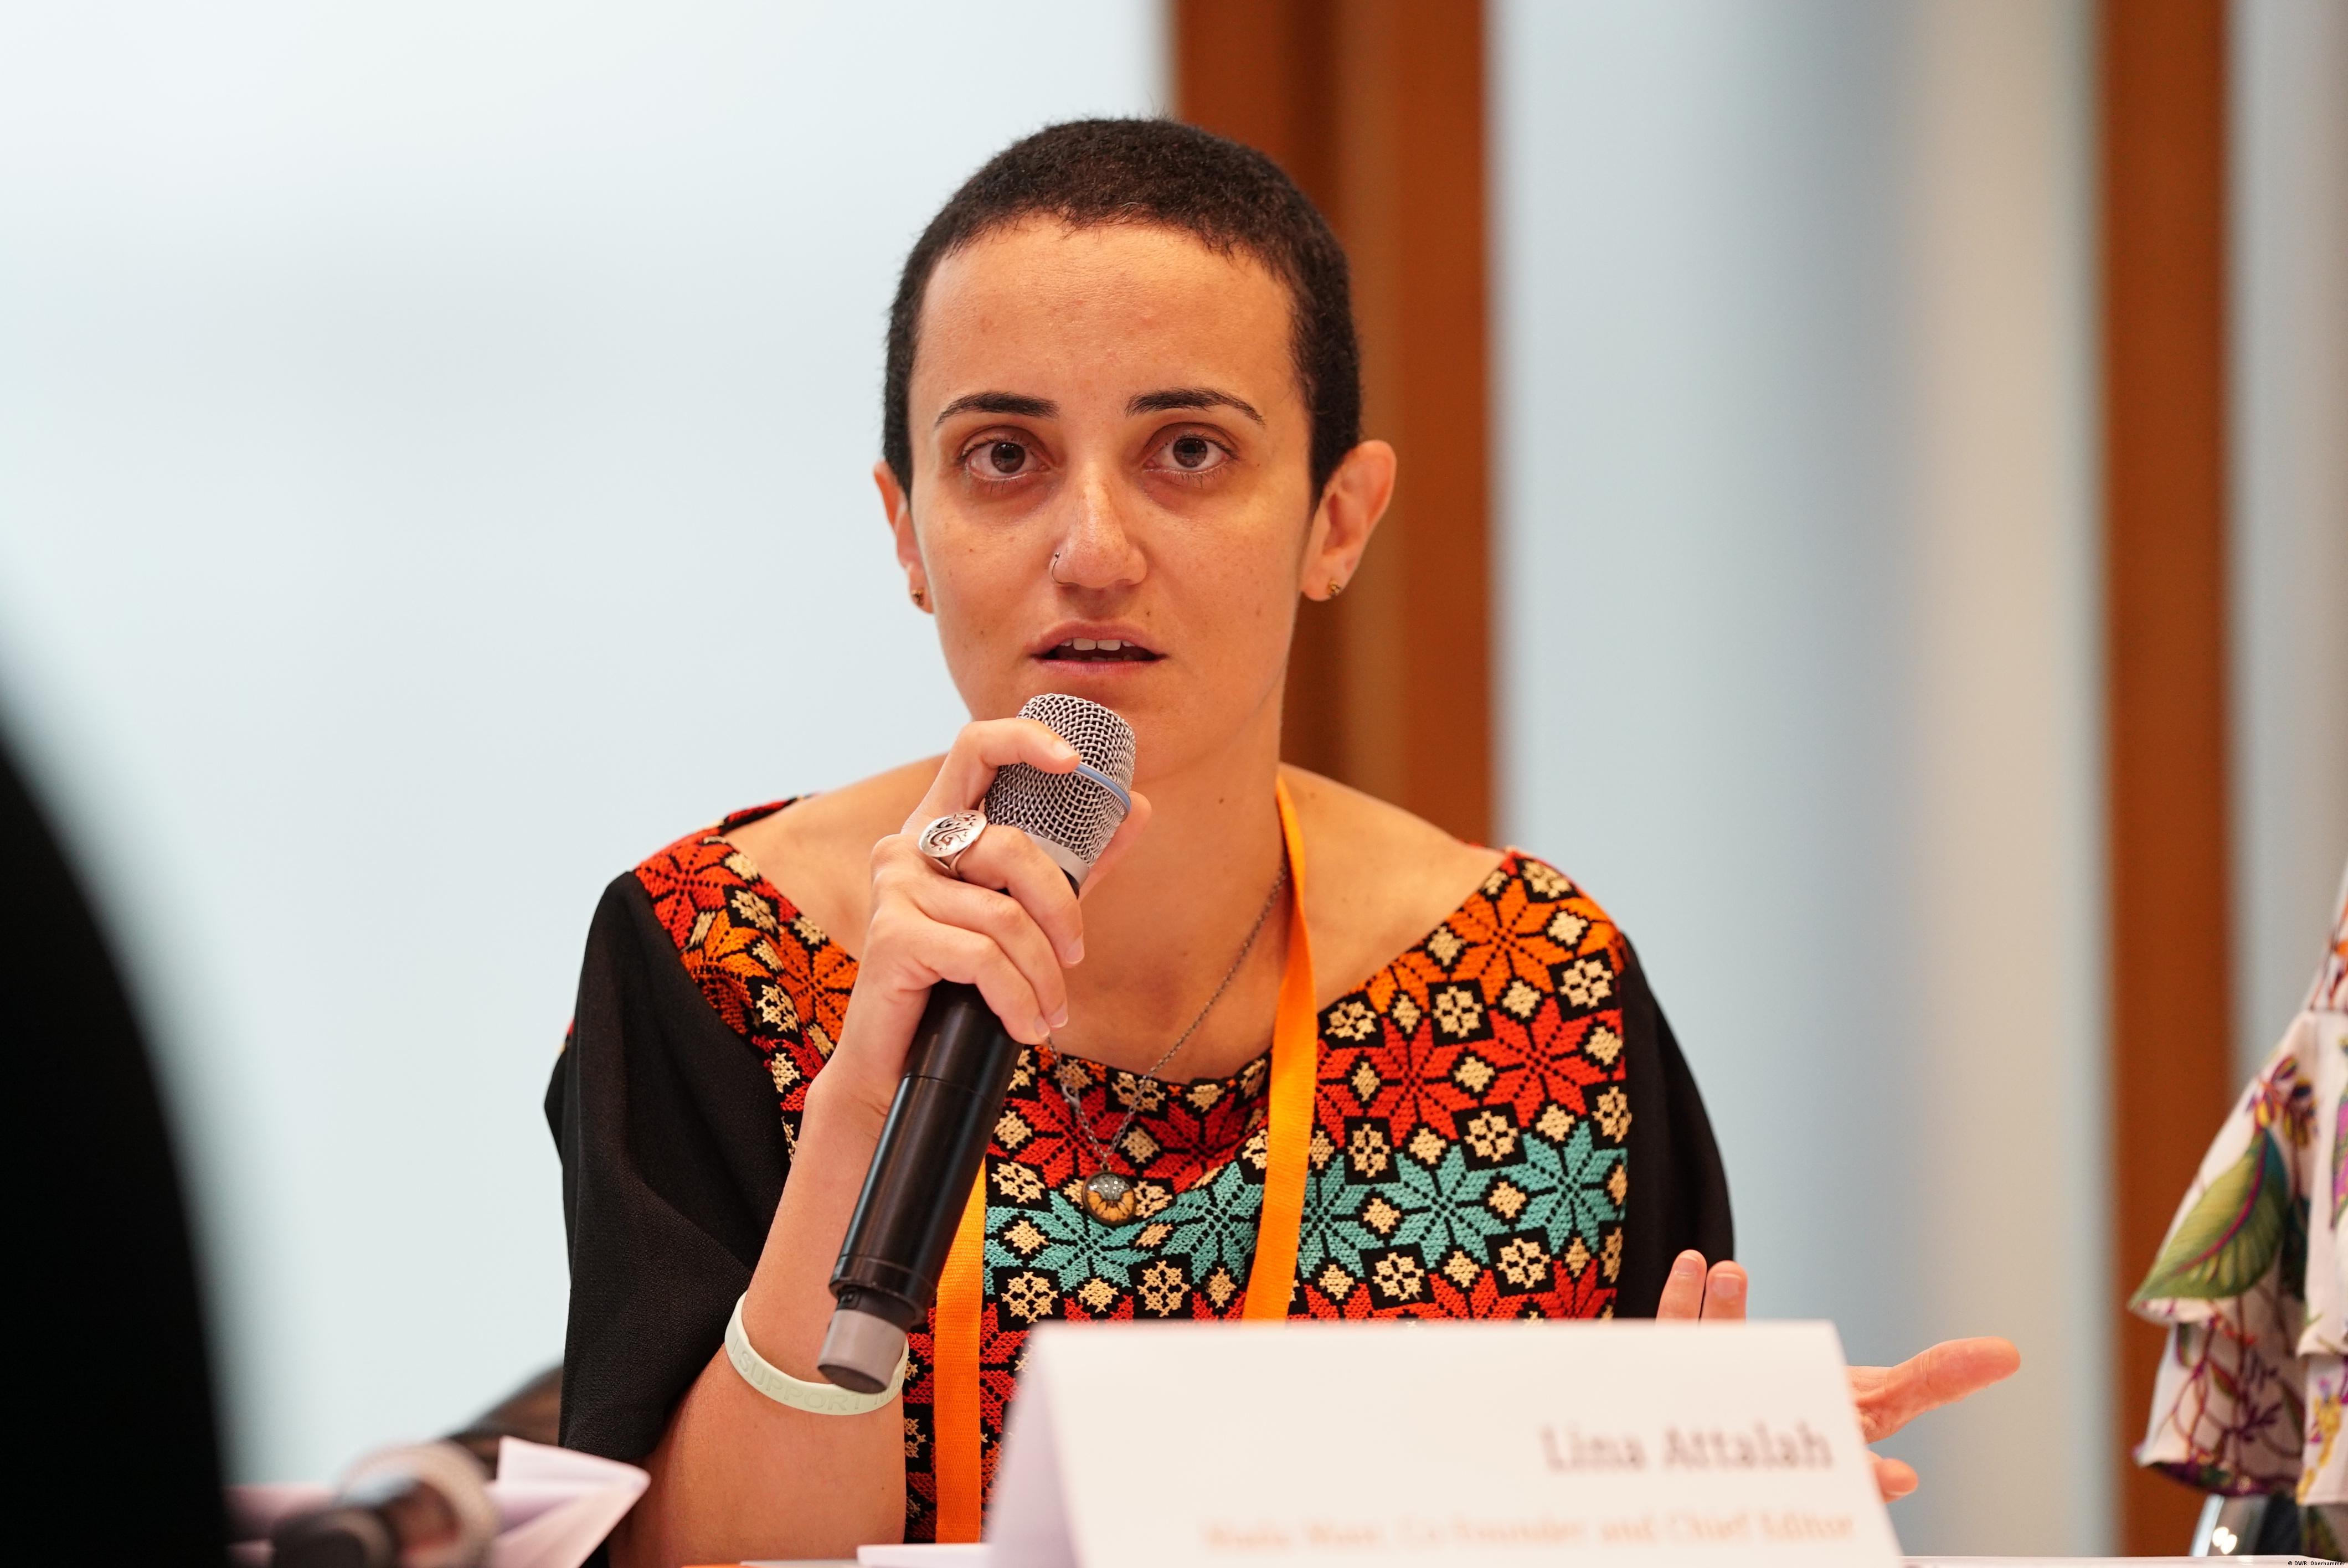 Mada Masr's editor-in-chief, Lina Attalah, spoke at DW's Global Media forum in 2018